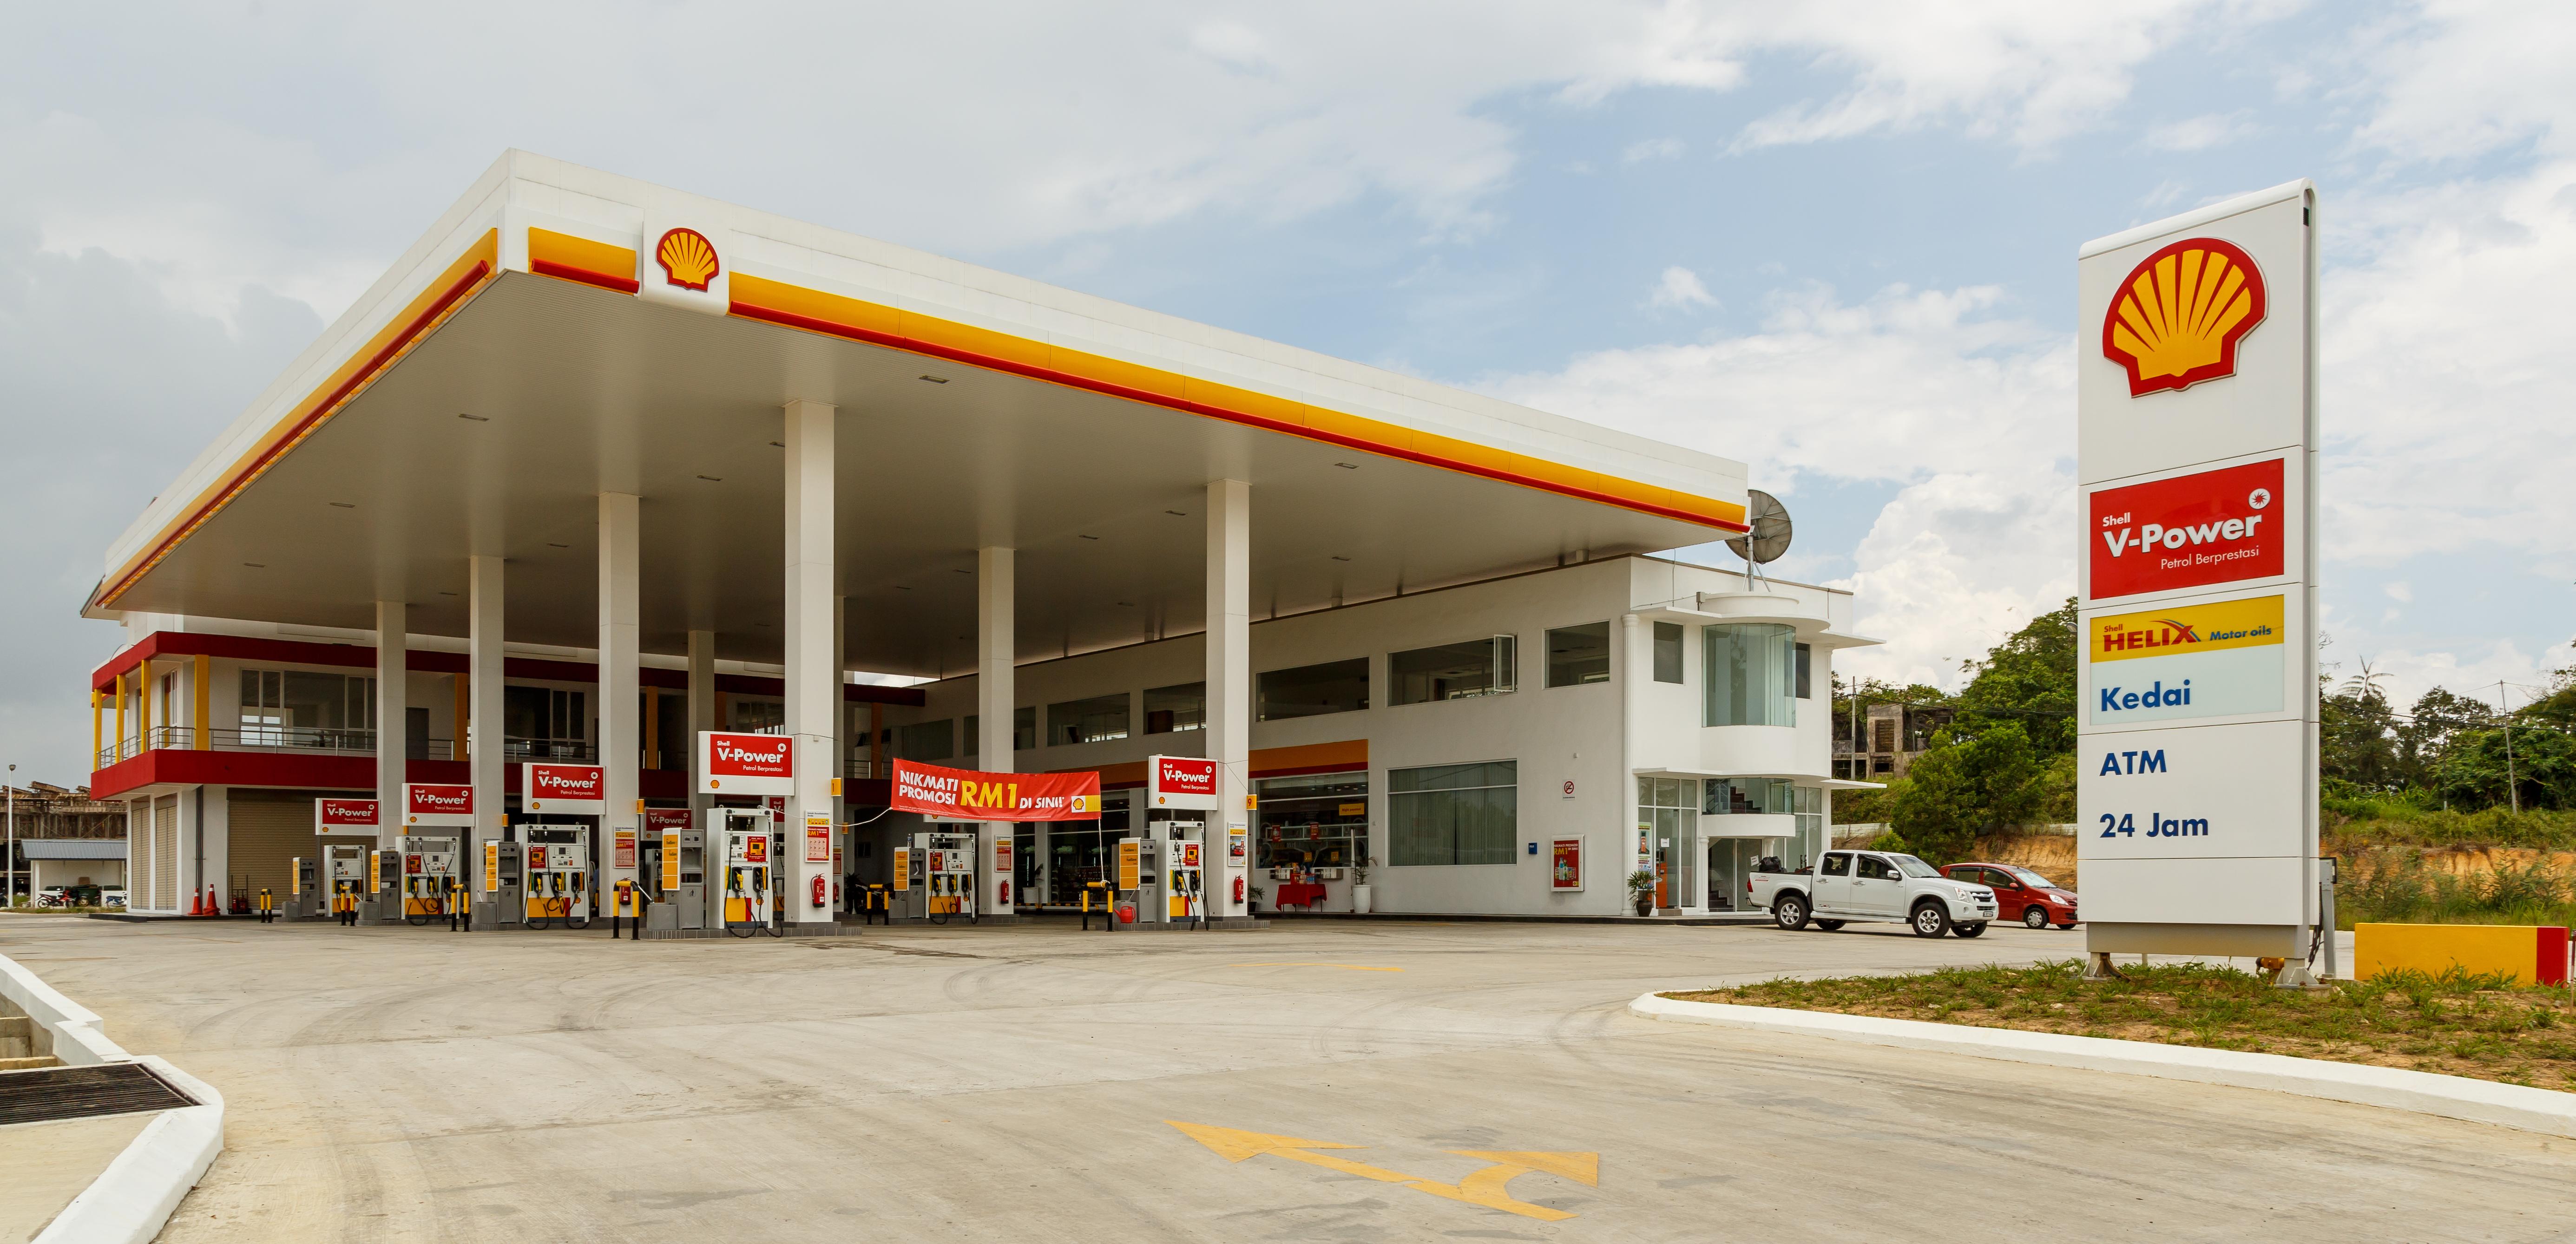 Shell station. Photo courtesy: Wiki